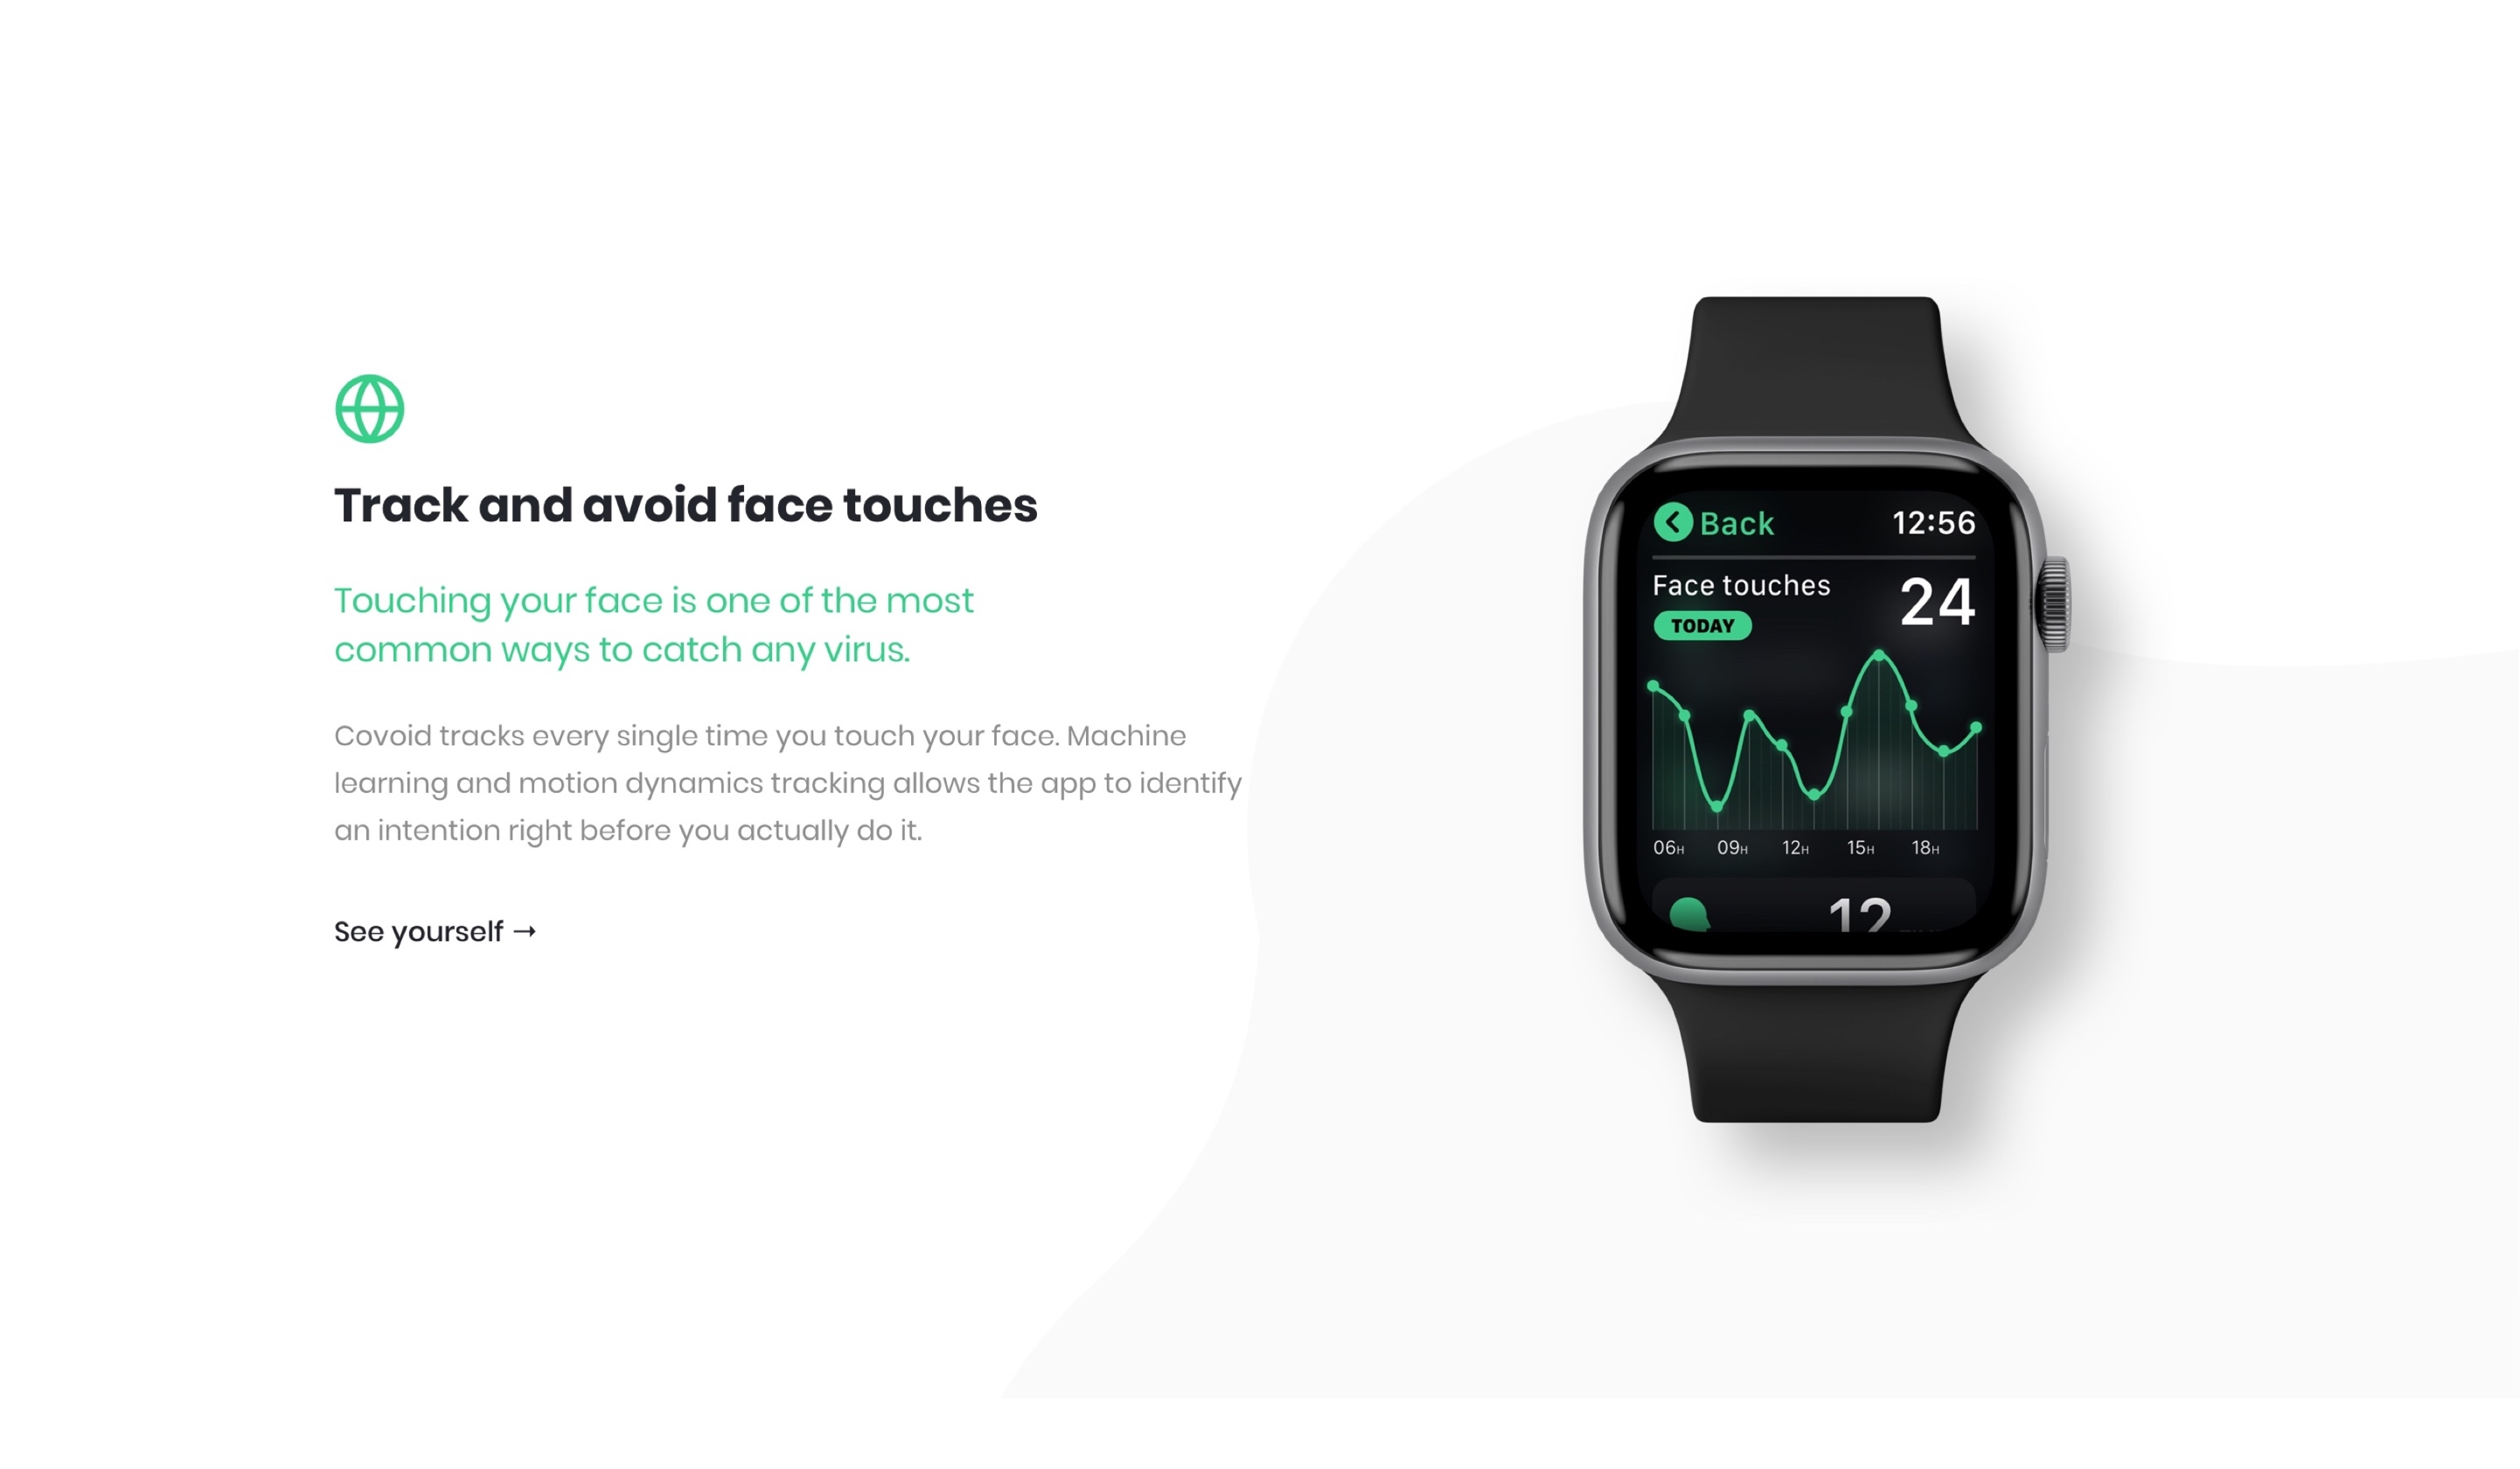 Watch app feature list